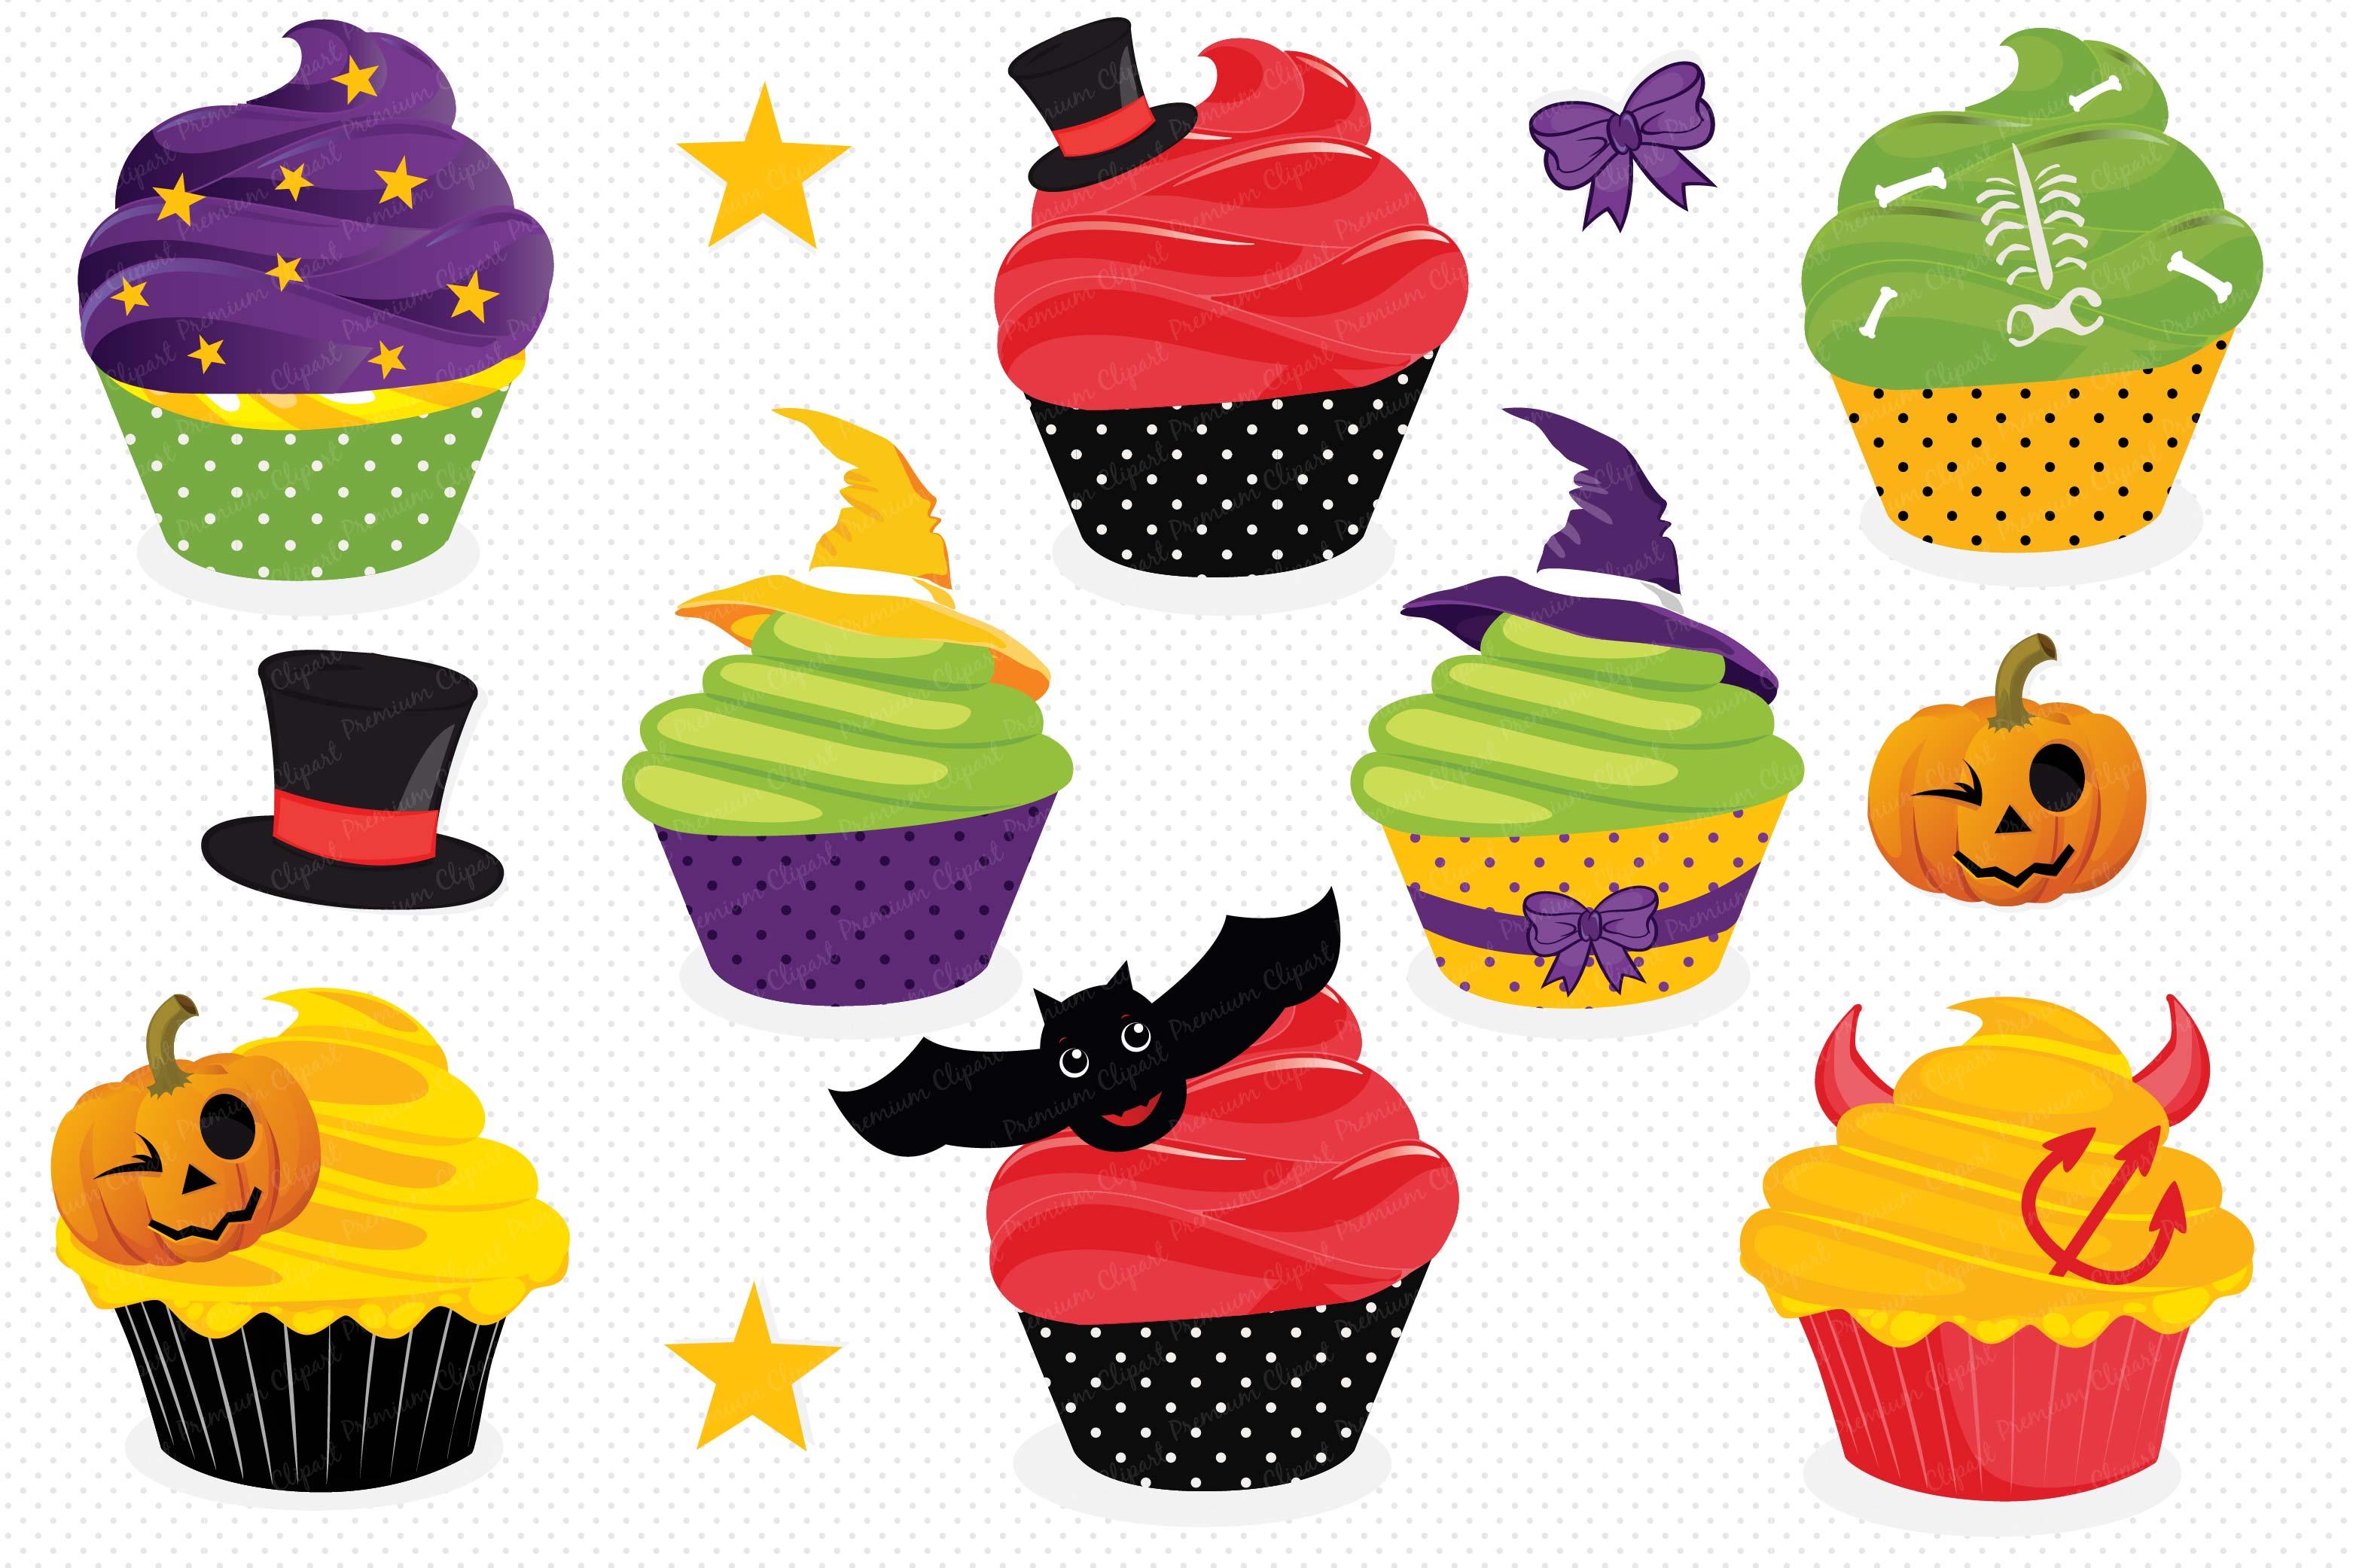 Halloween cupcake clipart, Haloween cupcake graphics.